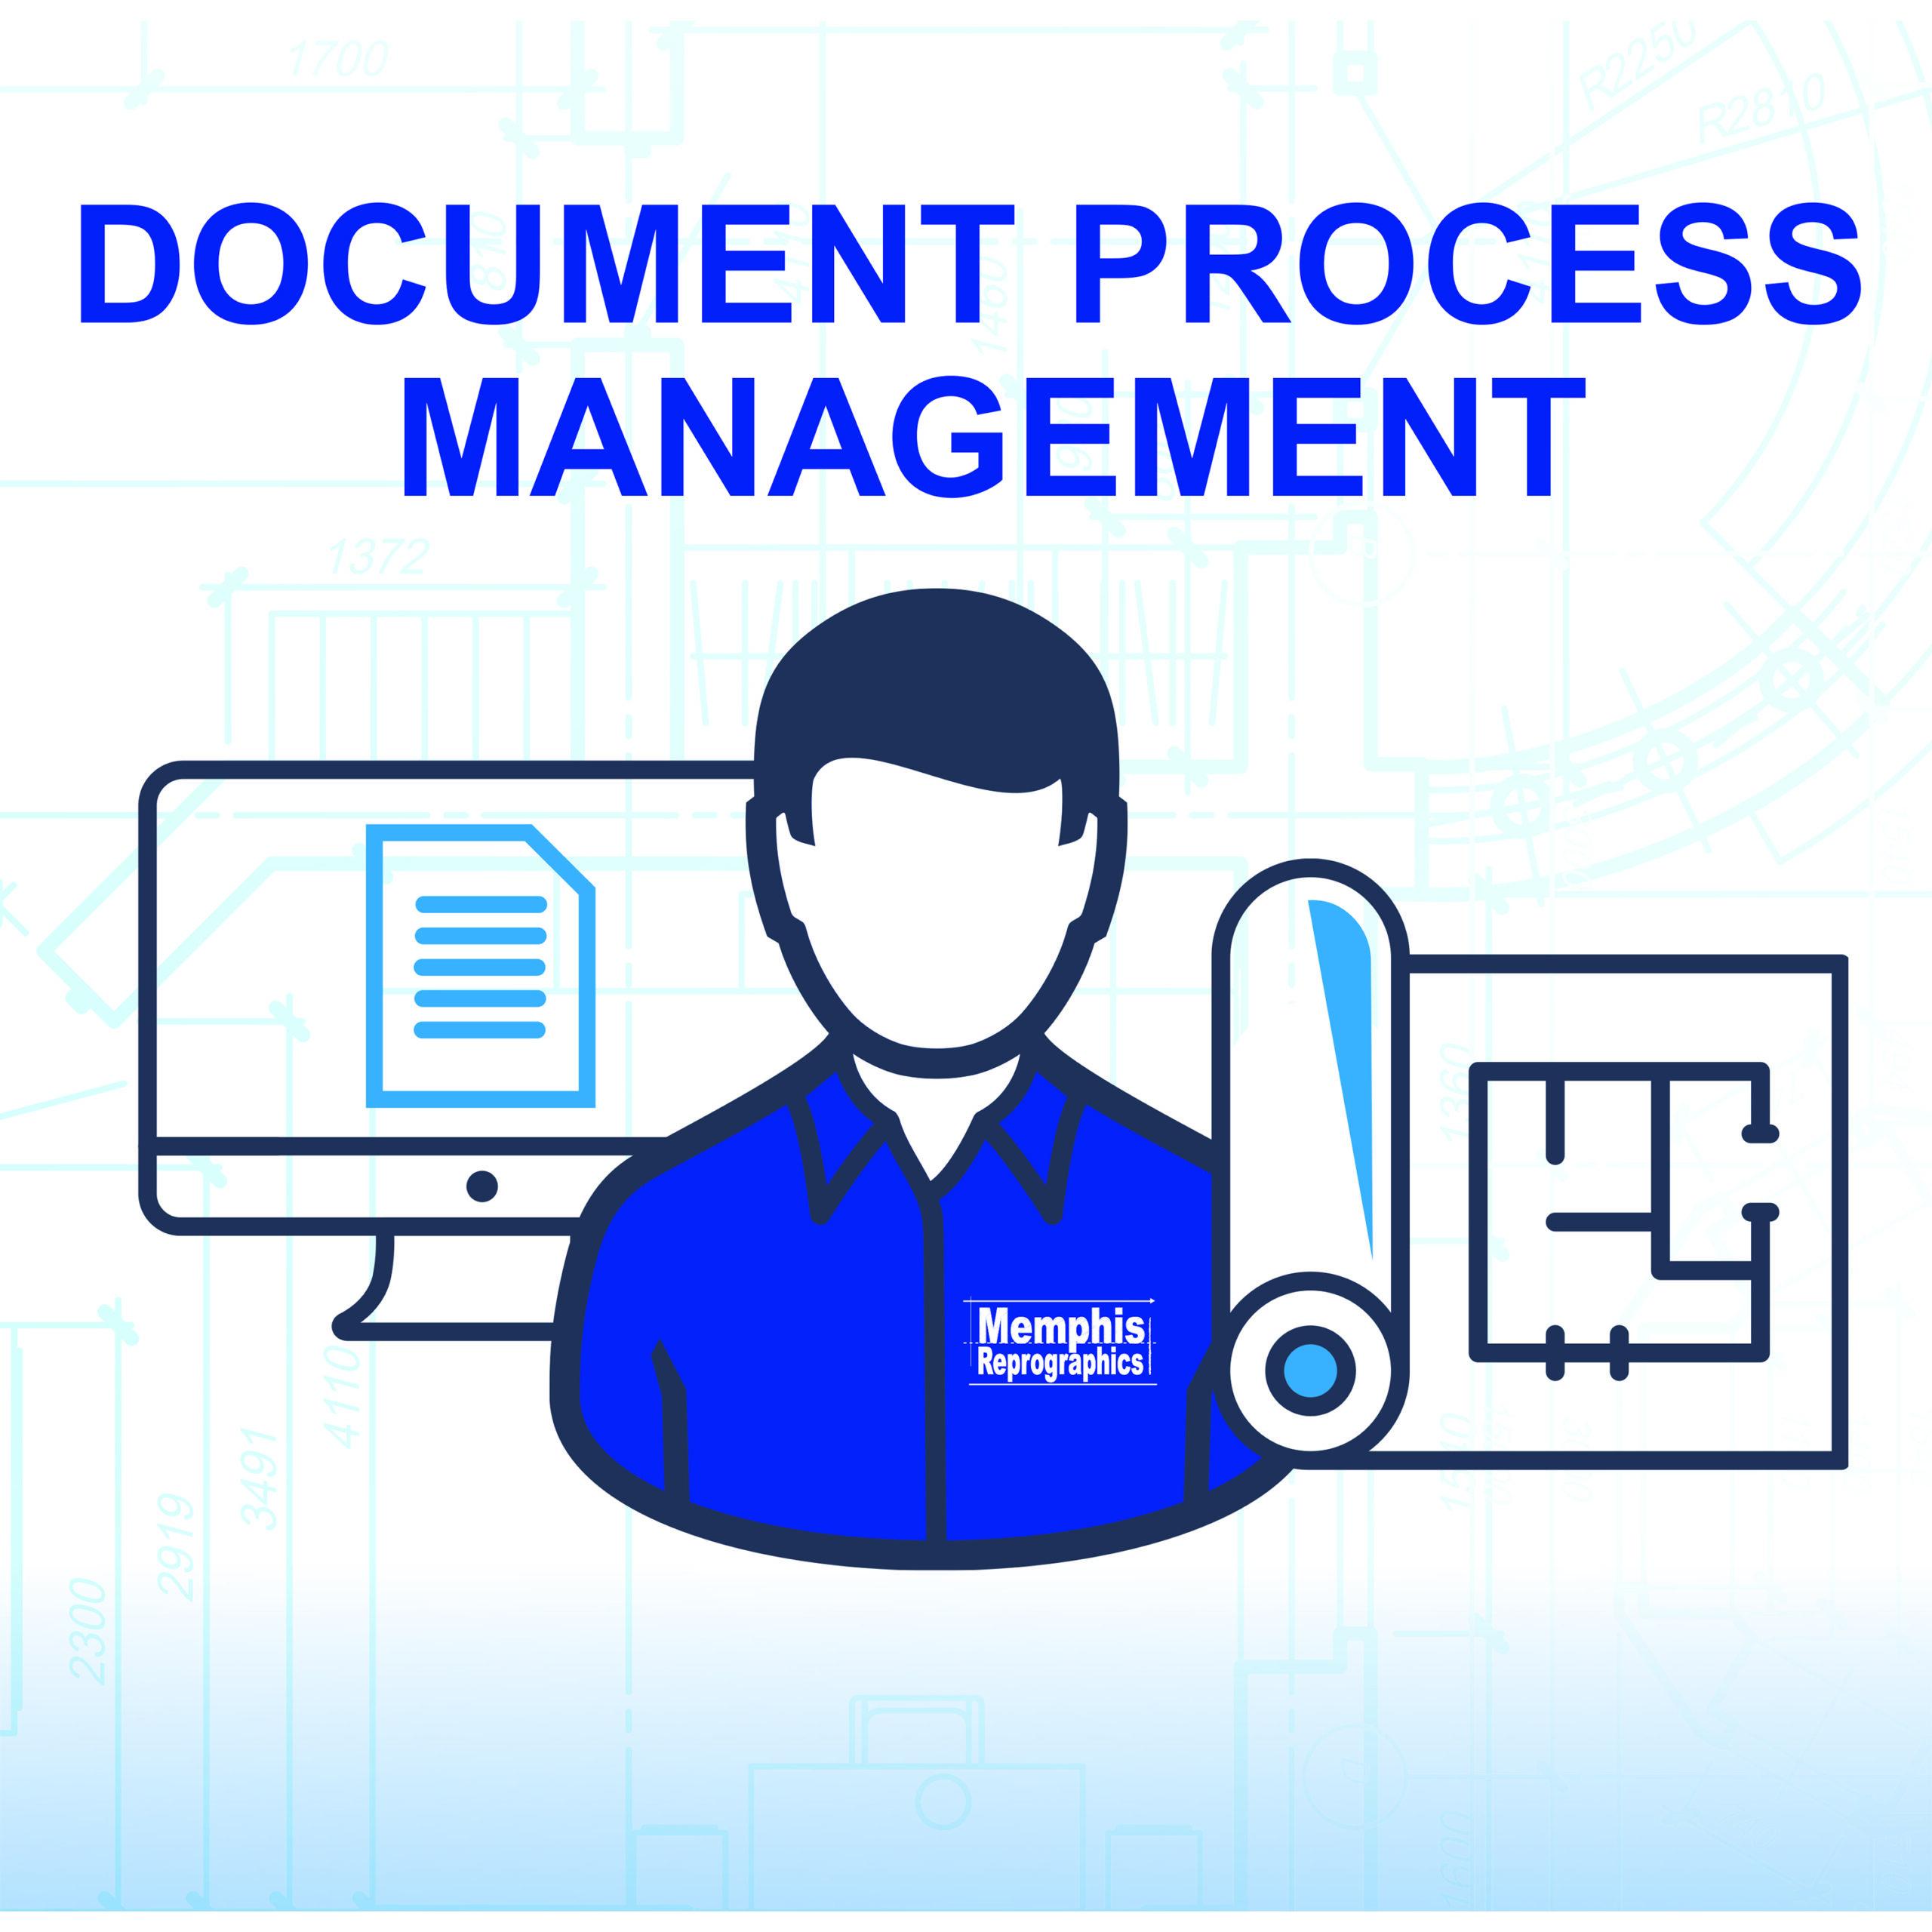 DOCUMENT PROCESS MANAGMENT